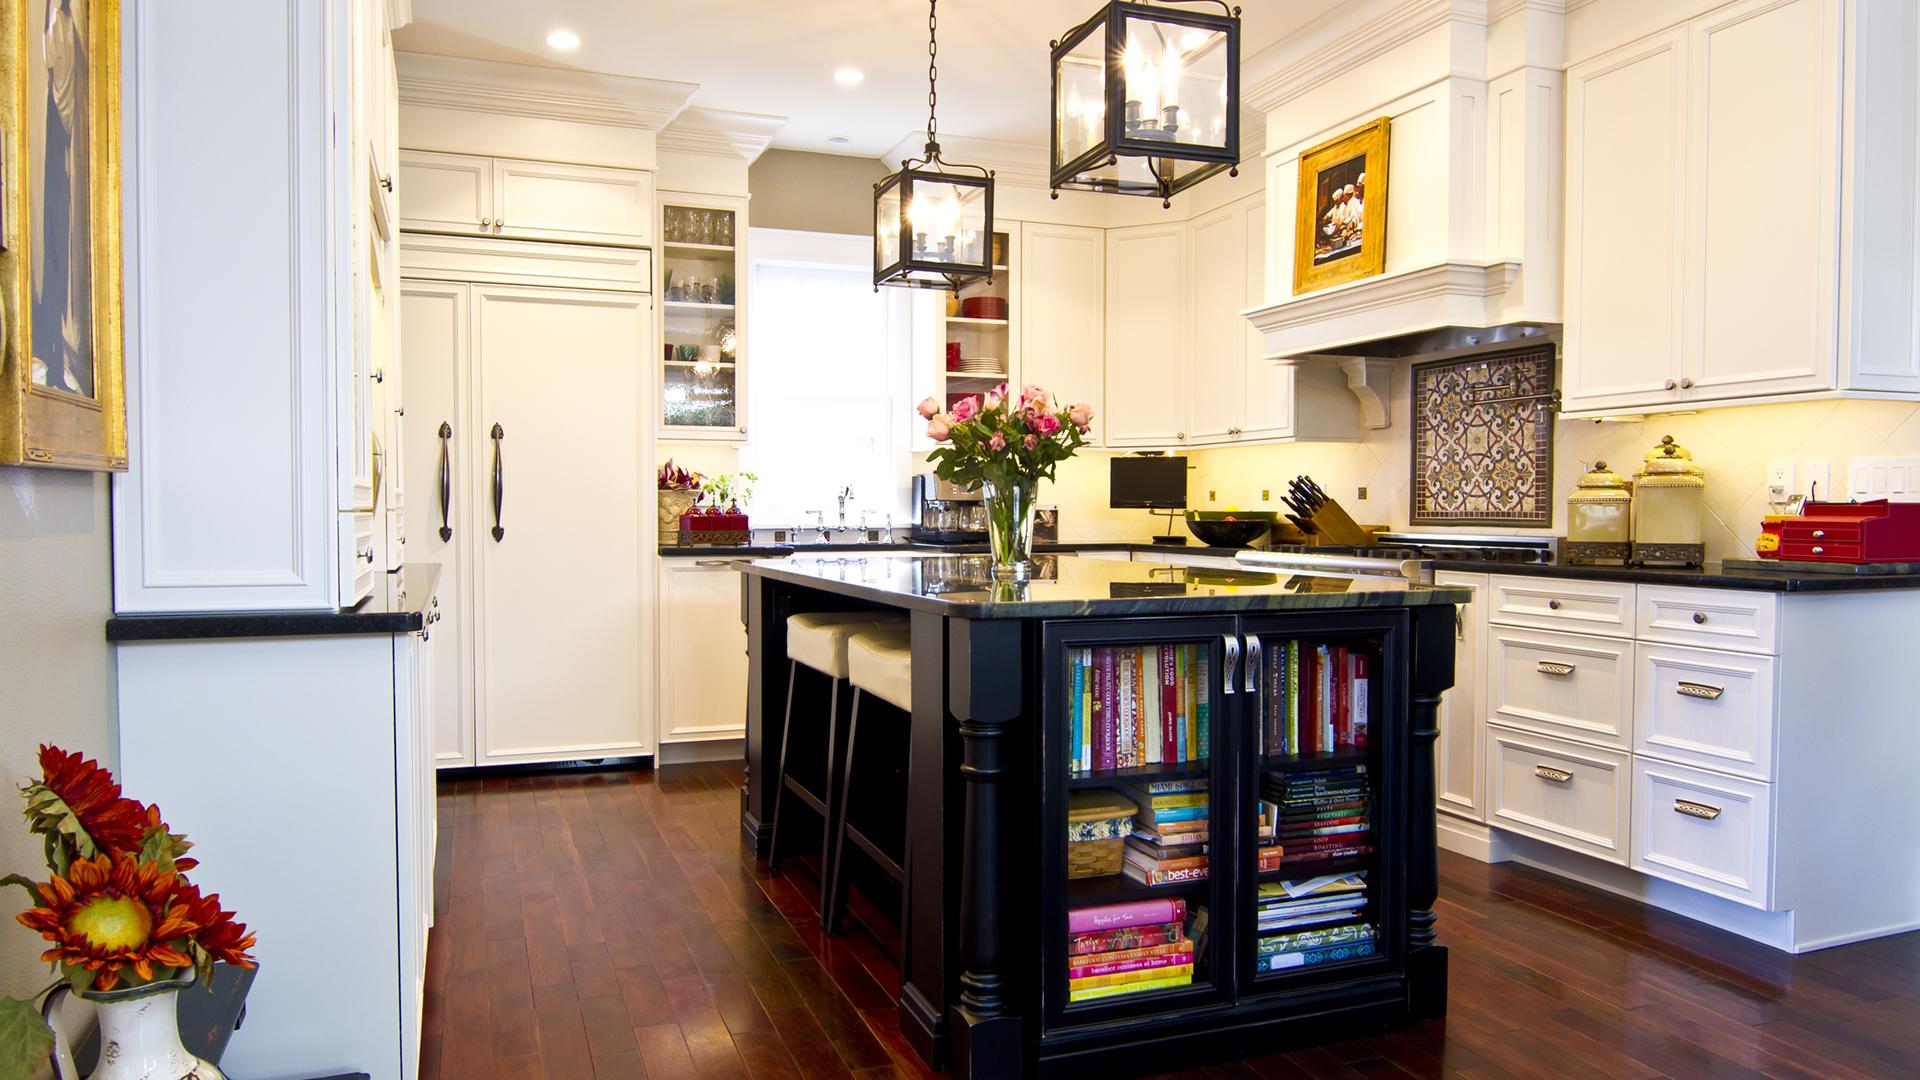 monarch kitchen island backsplash designs for and bath design orlando cabinets